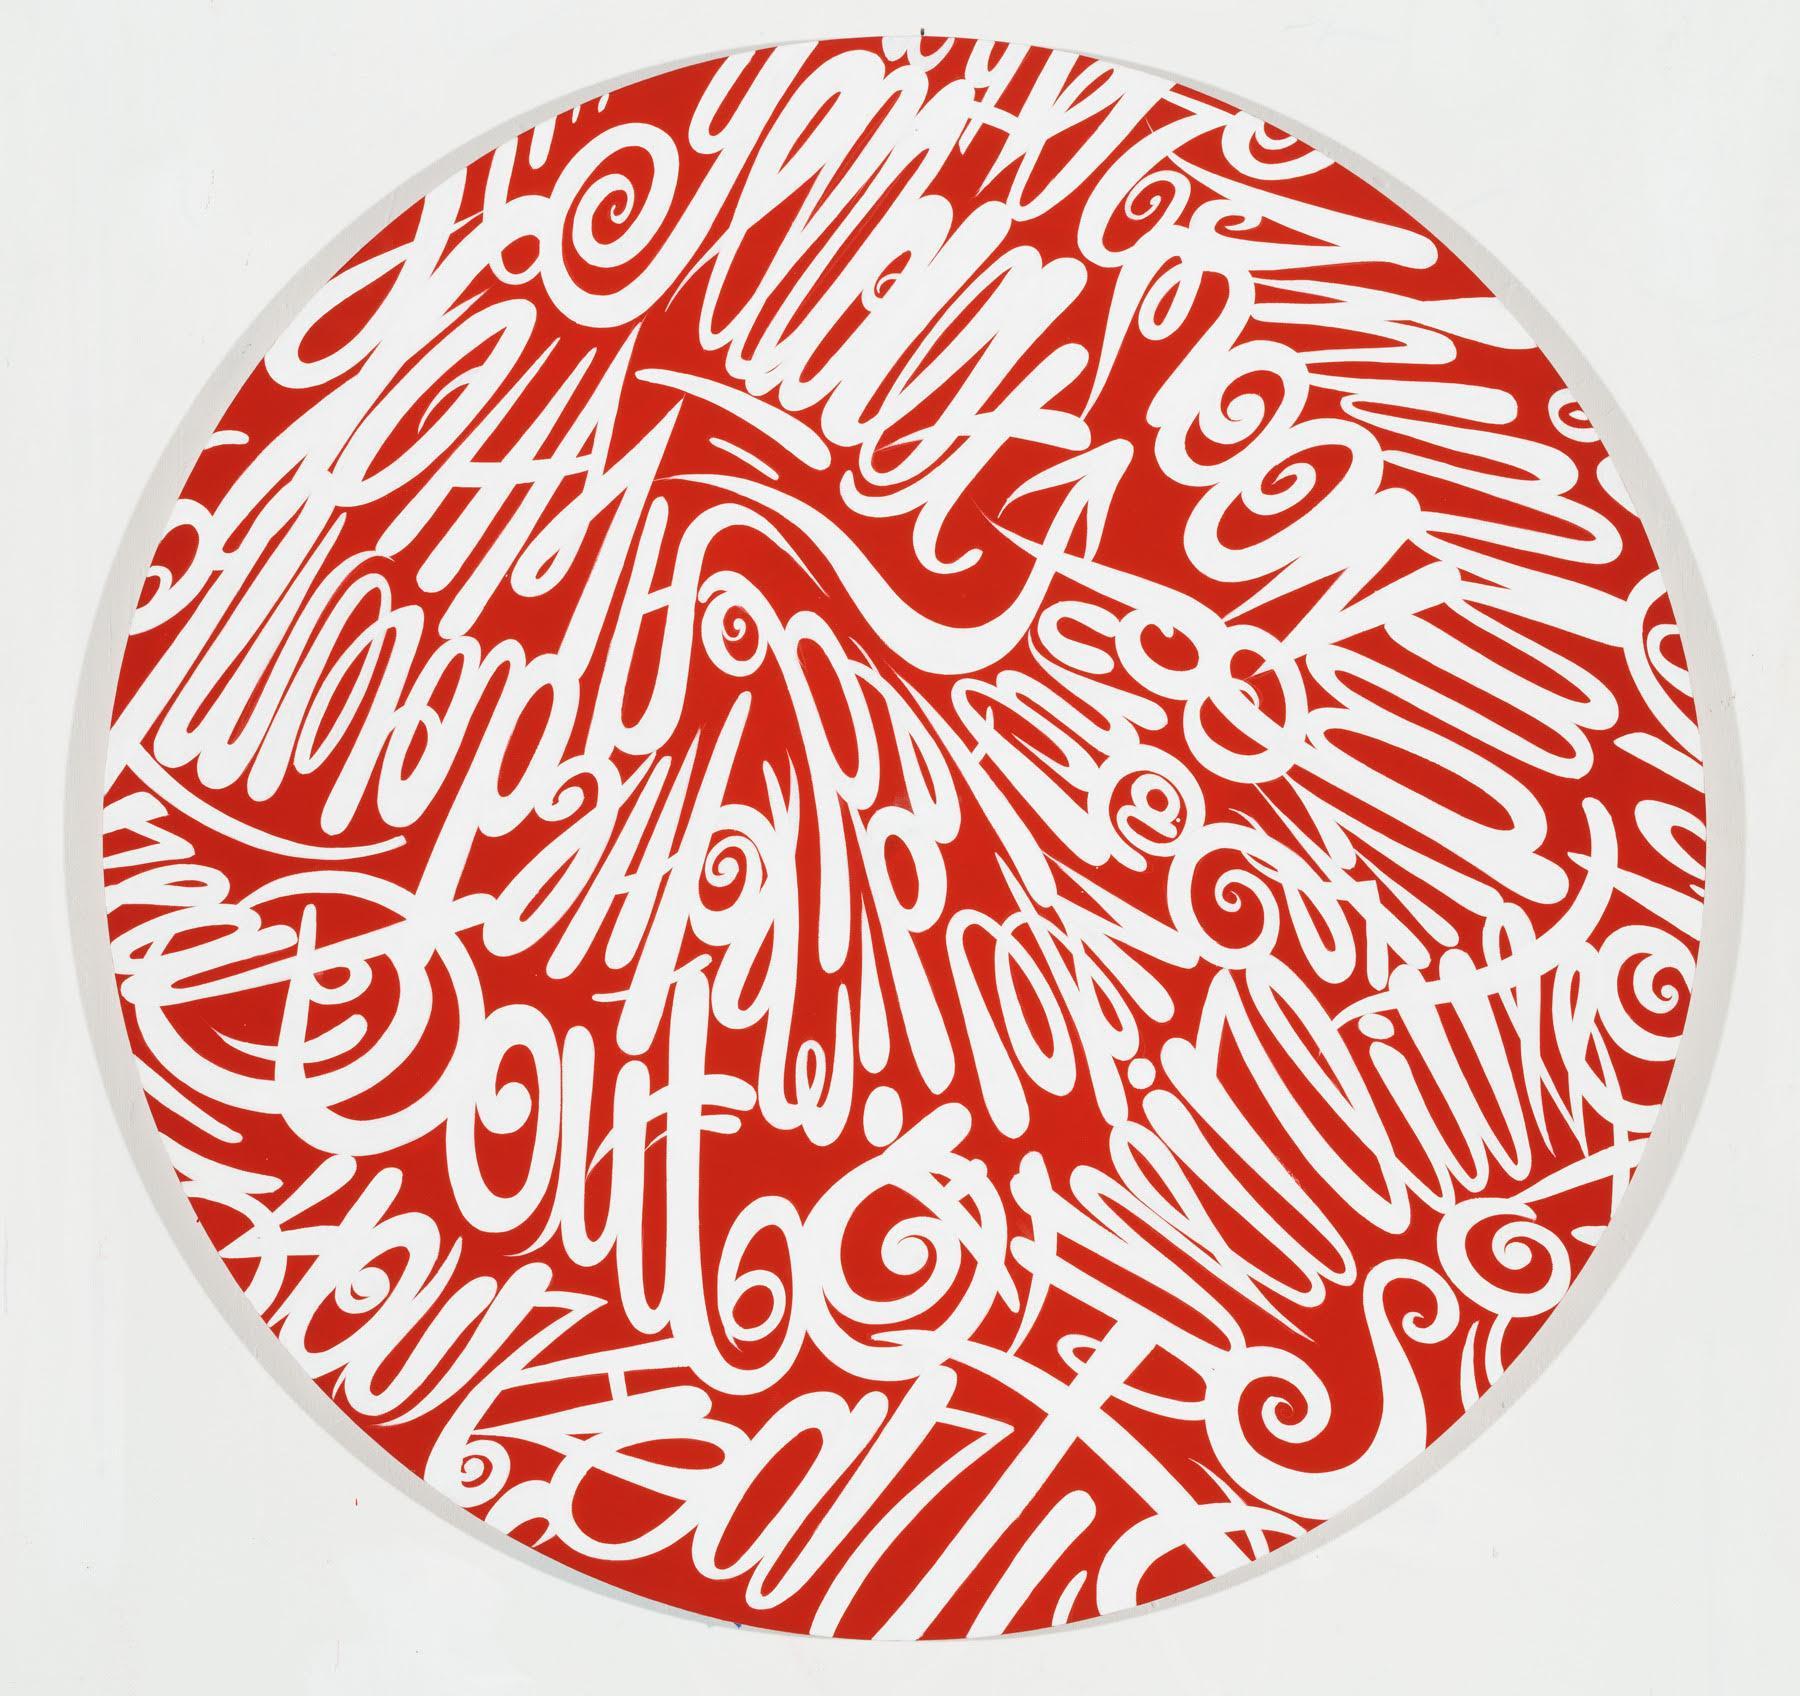 Breakout, Eric Inkala Street Art Graffiti Round Red White Round